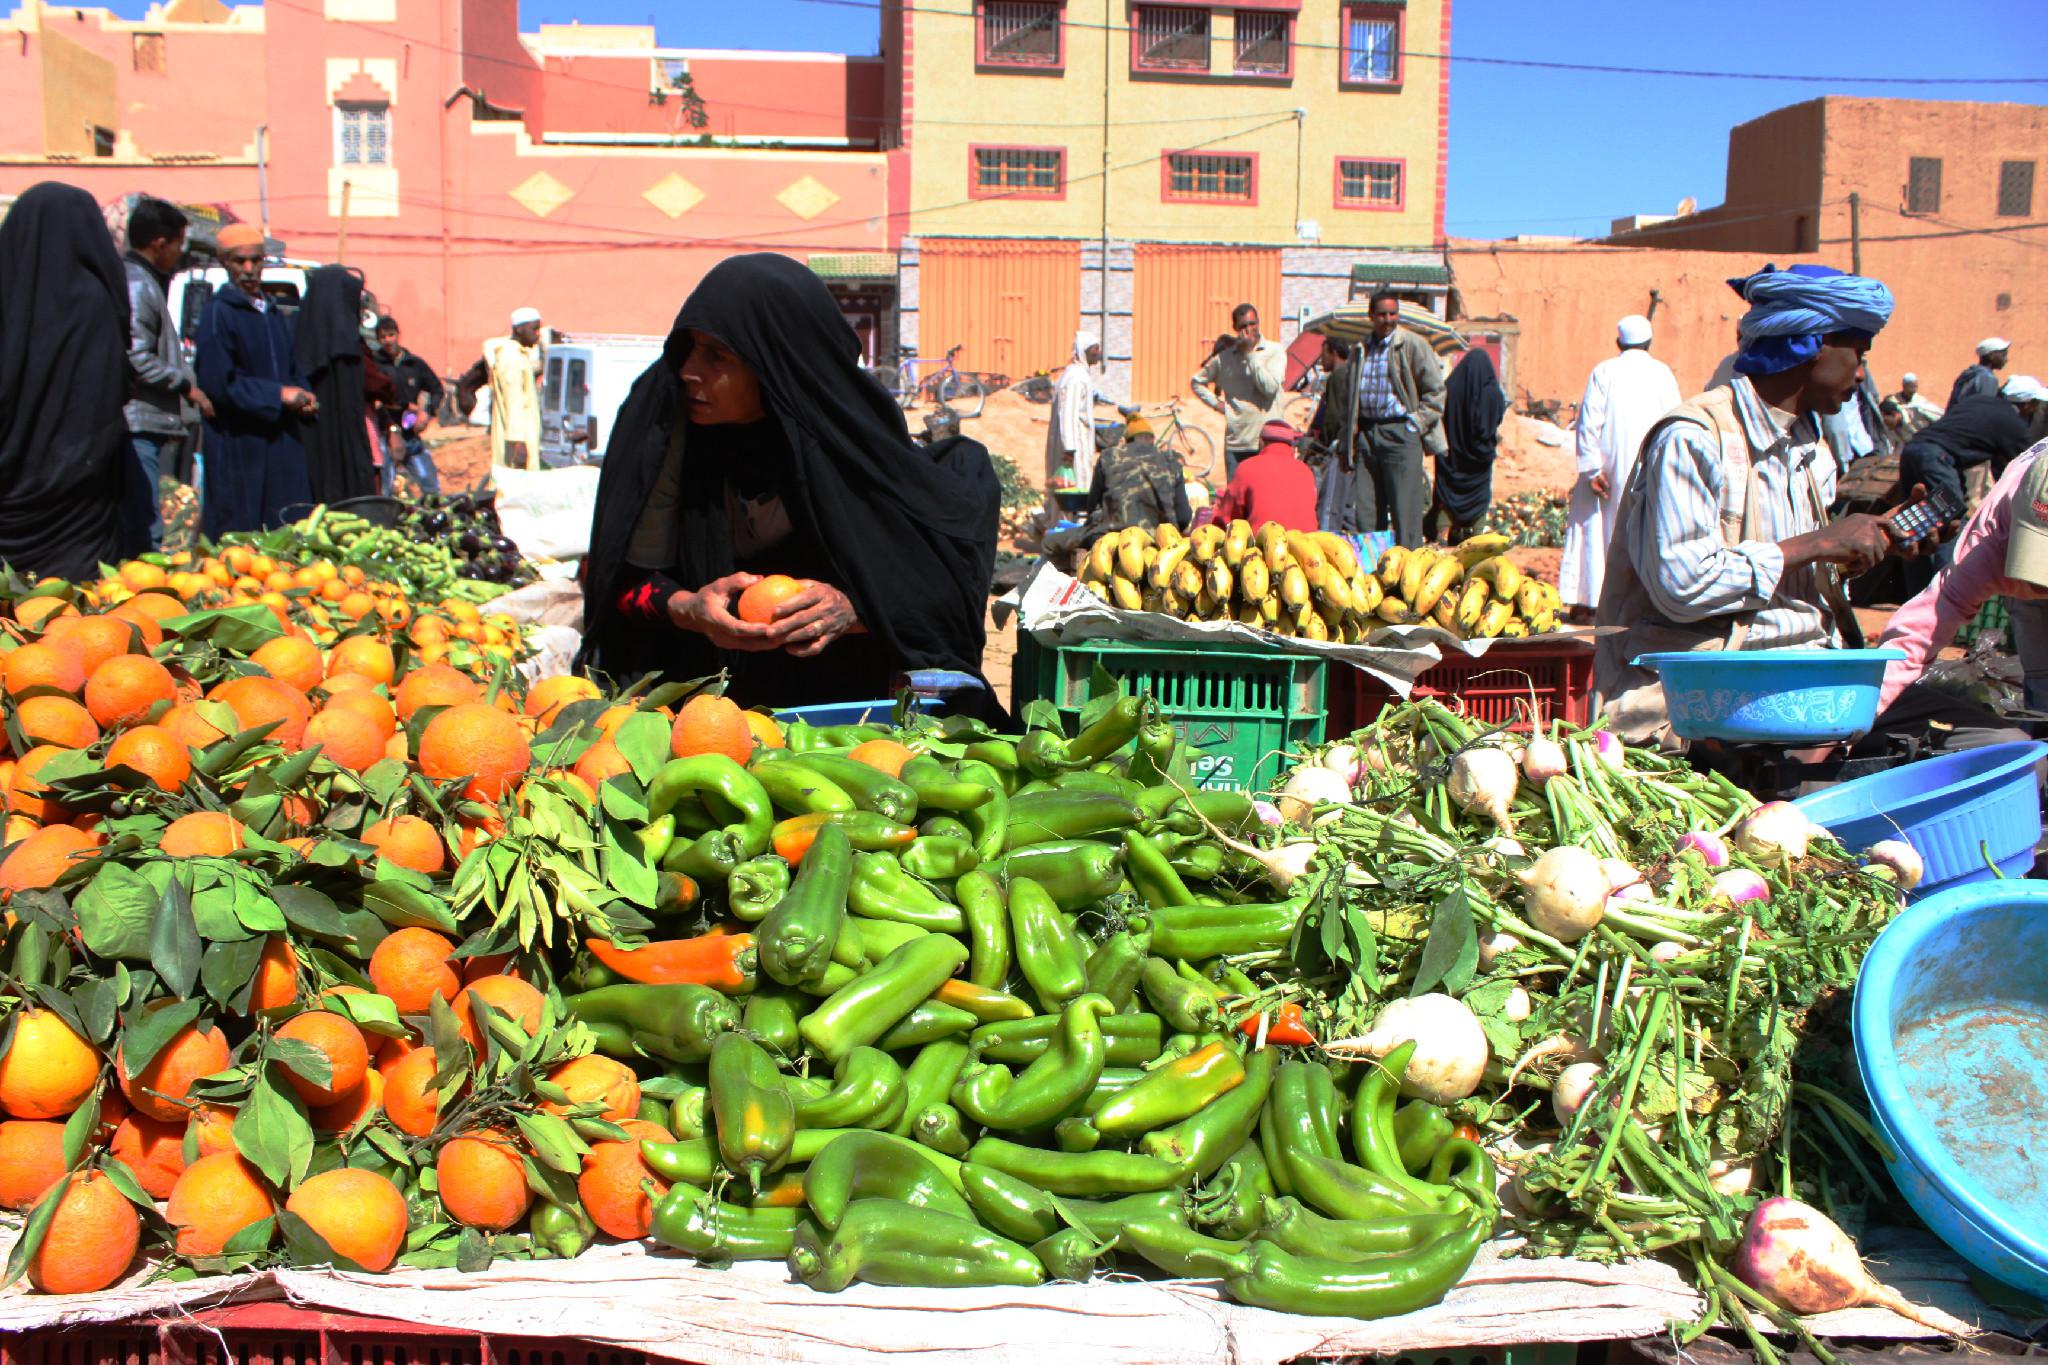 capture the colour contest - green - market in essaouira